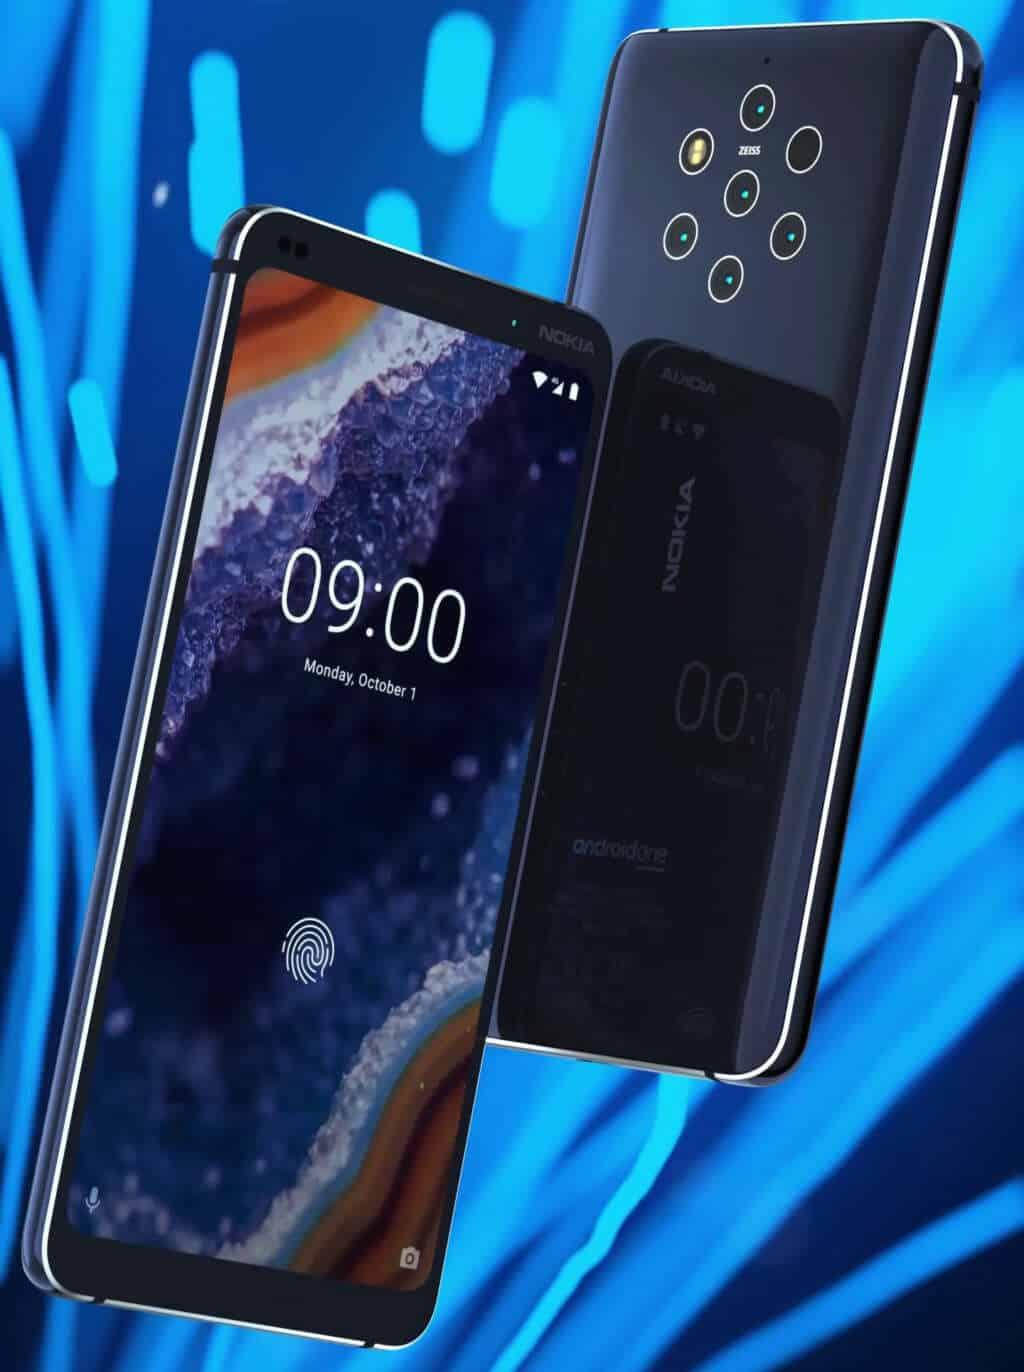 Nokia 9 PureView, el celular con cinco cámaras, se filtró por completo.